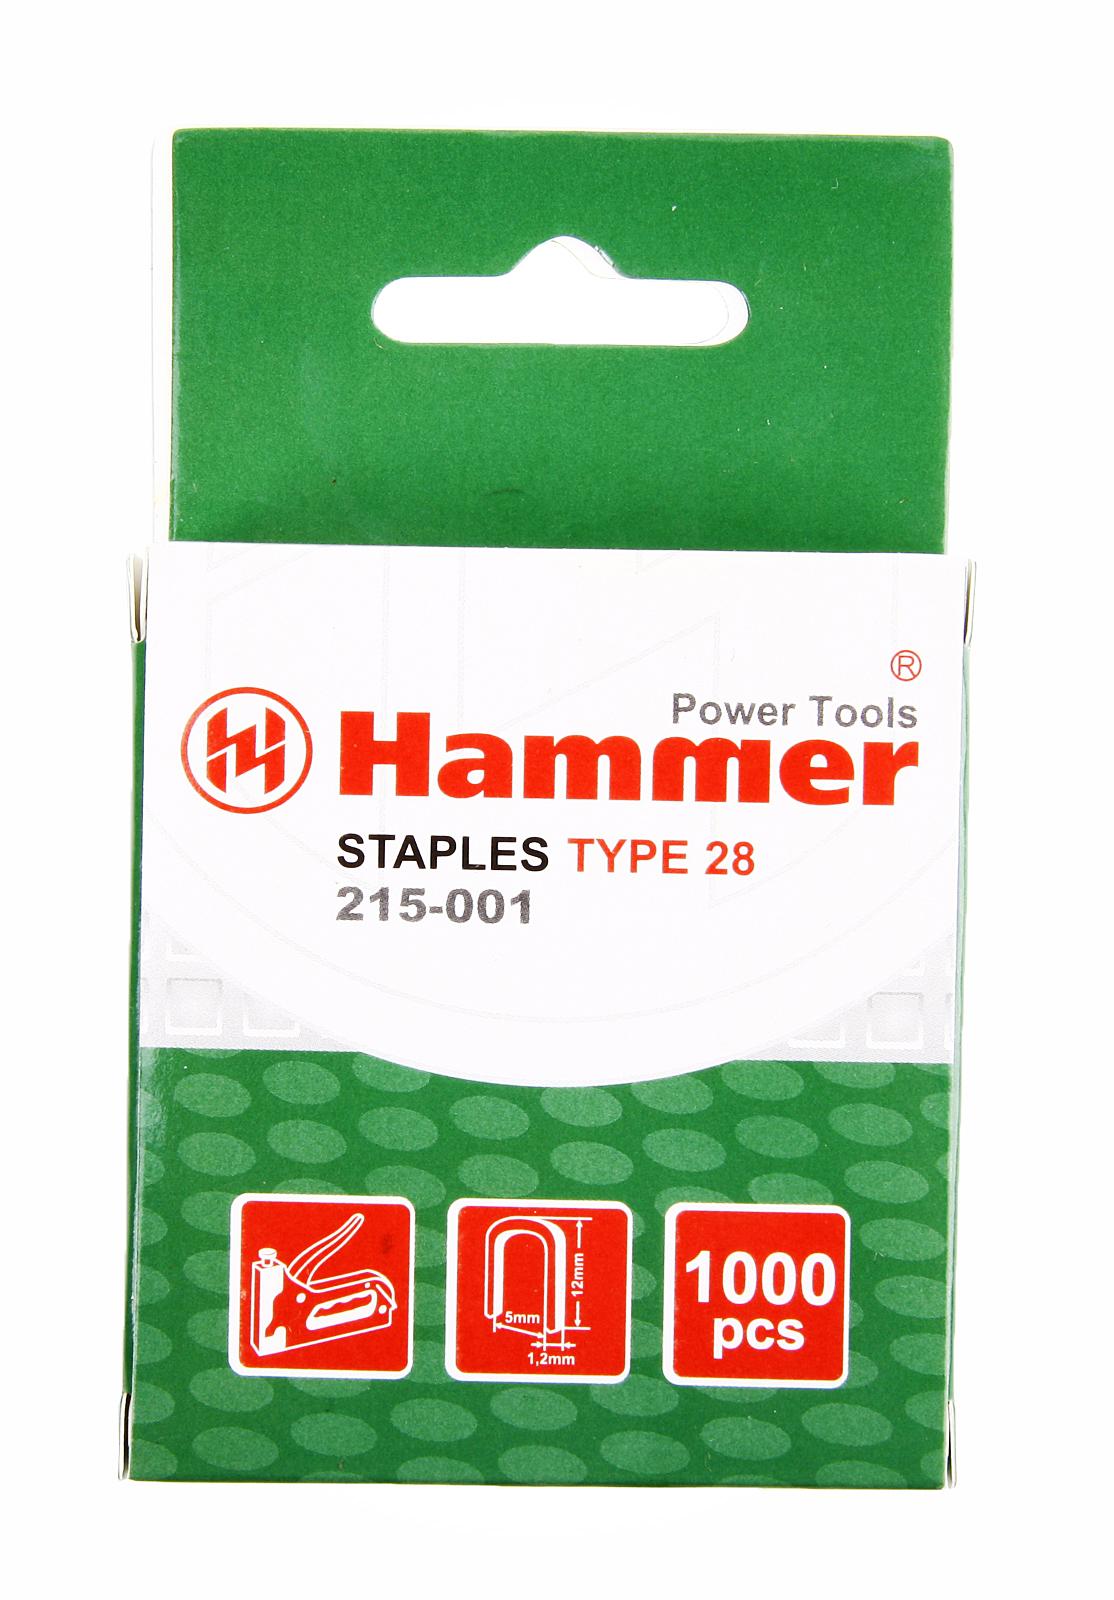 Скобы для степлера Hammer Скобы 12мм, 5мм, 1,2мм, u-образн. (тип 28) скобы для степлера rapid 12мм тип 53 5000шт workline 11859610